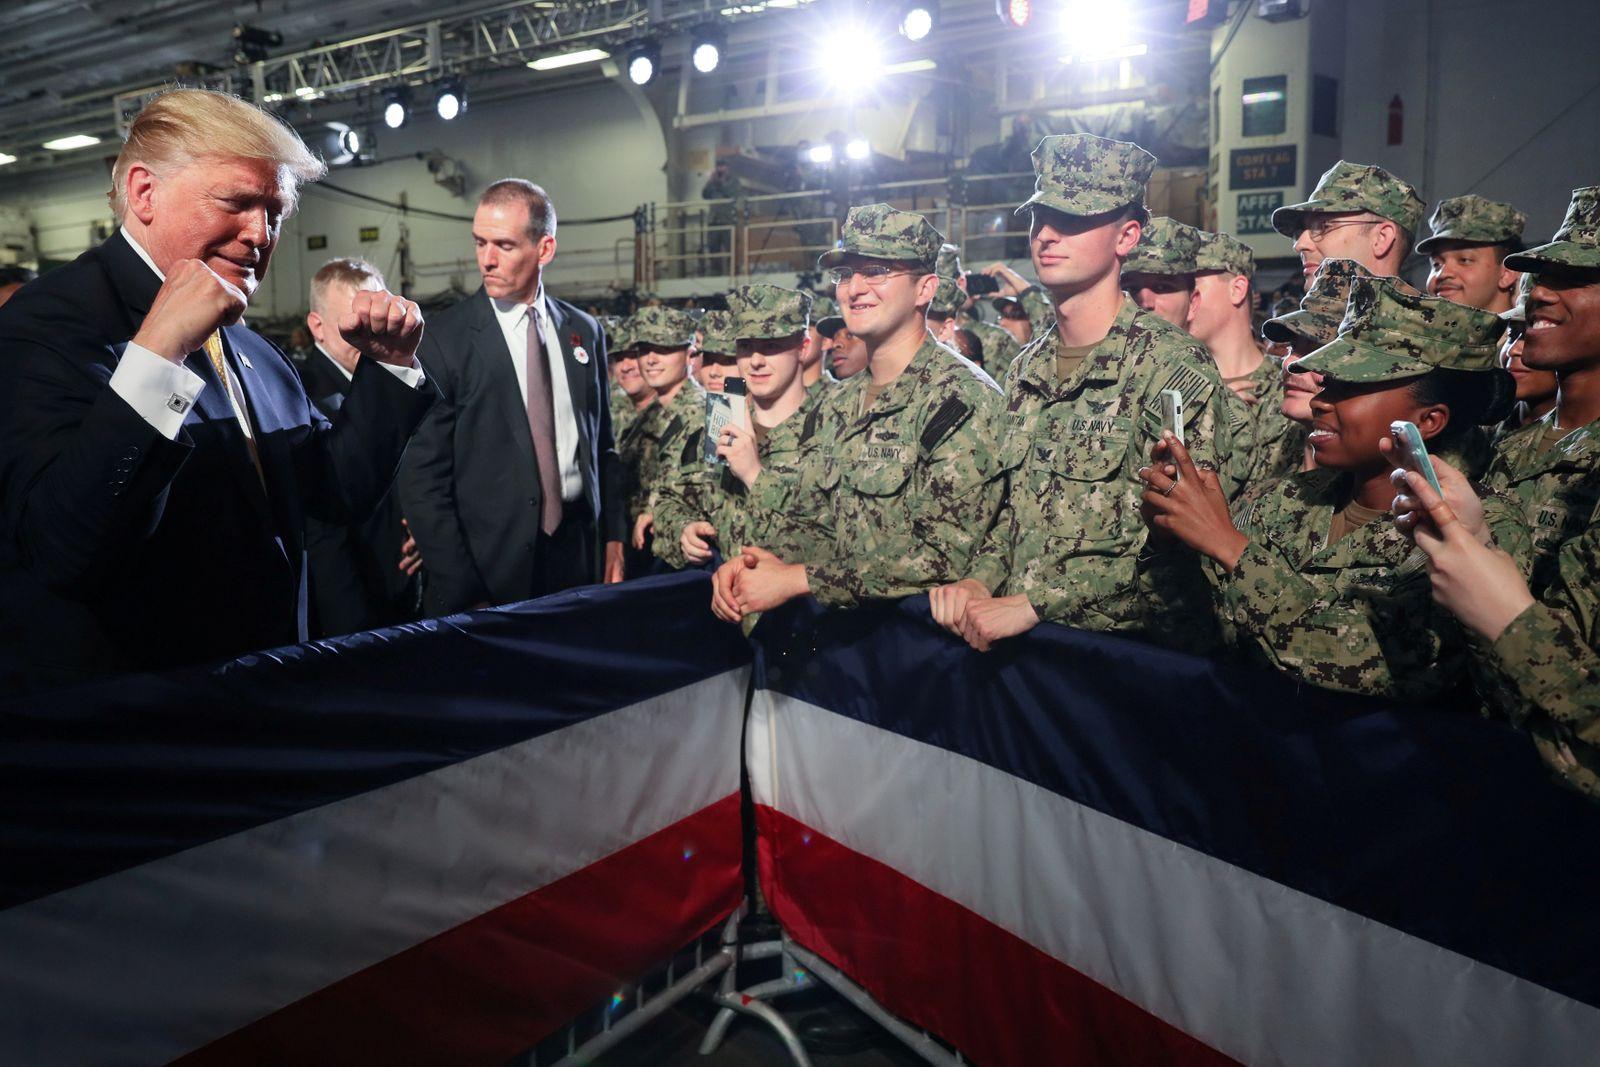 U.S. troops take photos of U.S. President Trump aboard the USS Wasp in Yokosuka